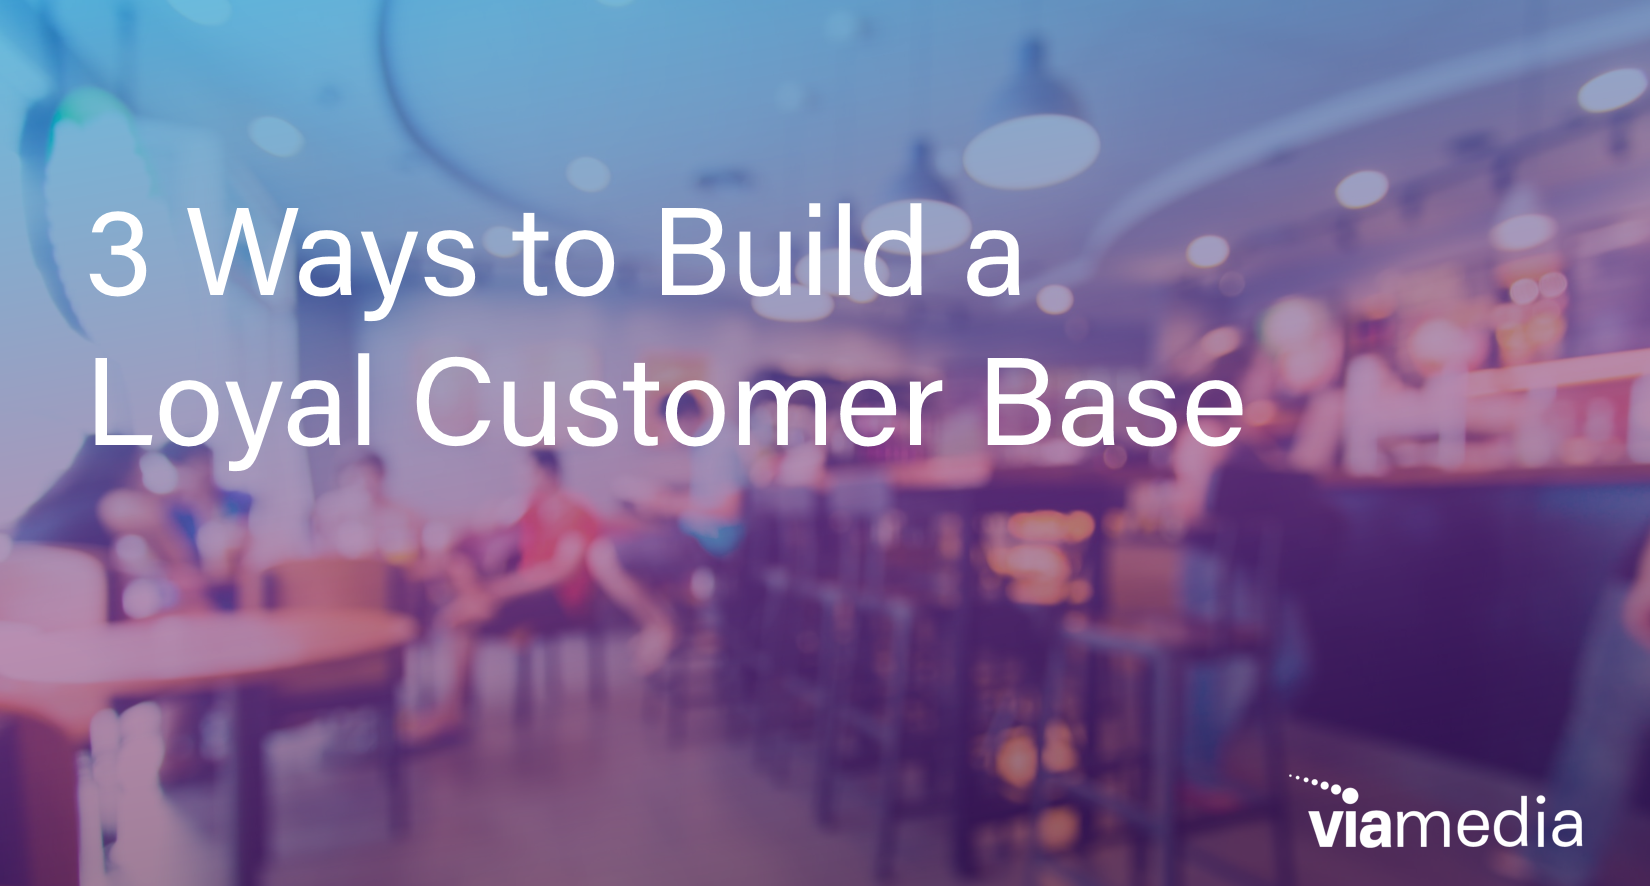 3 ways to build loyal customer base_for blog header